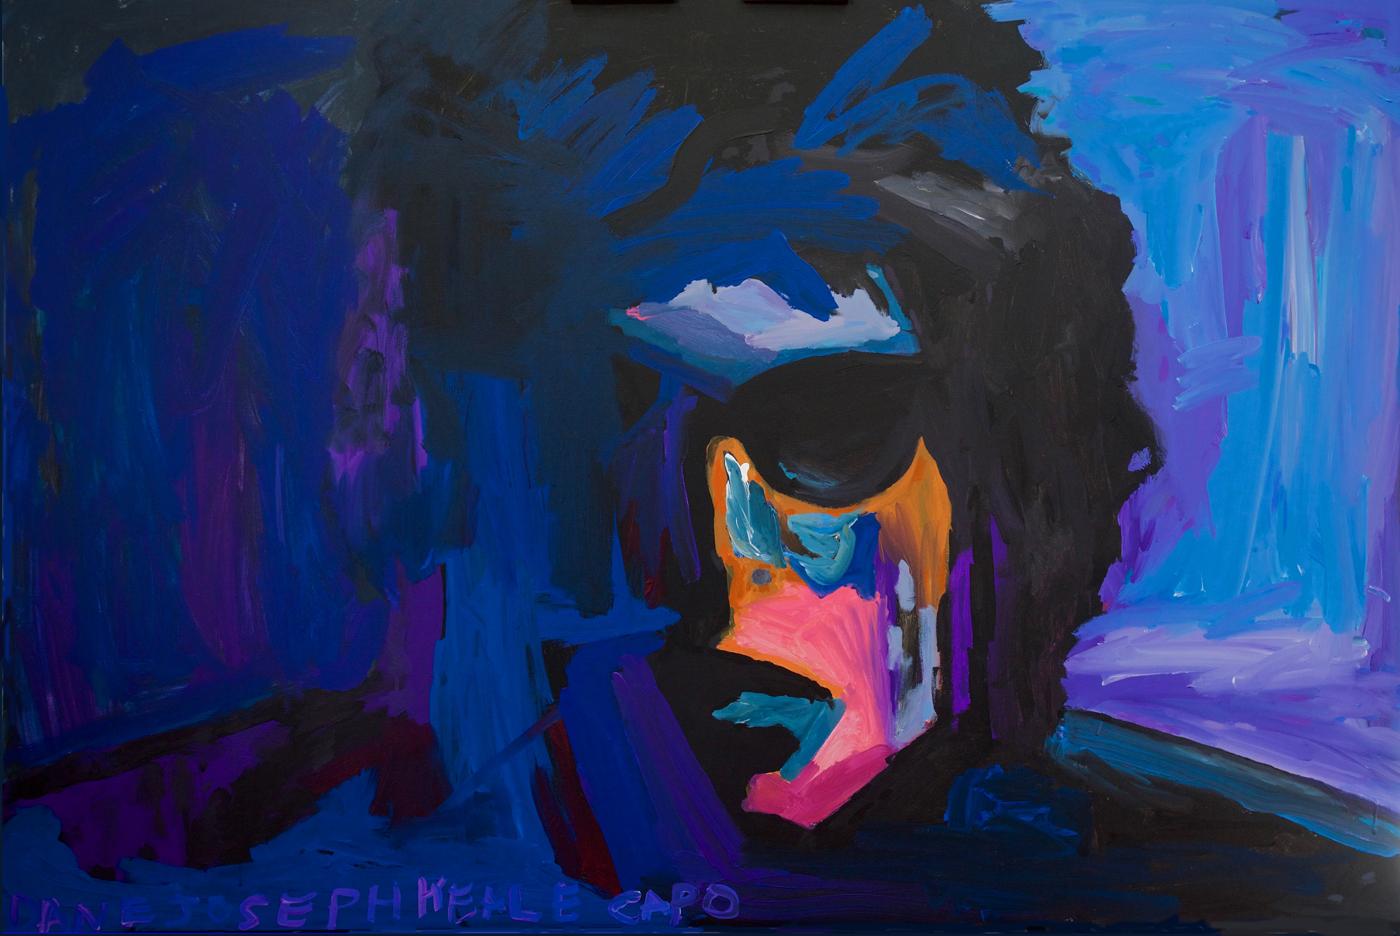 Dylan by Dane Capo